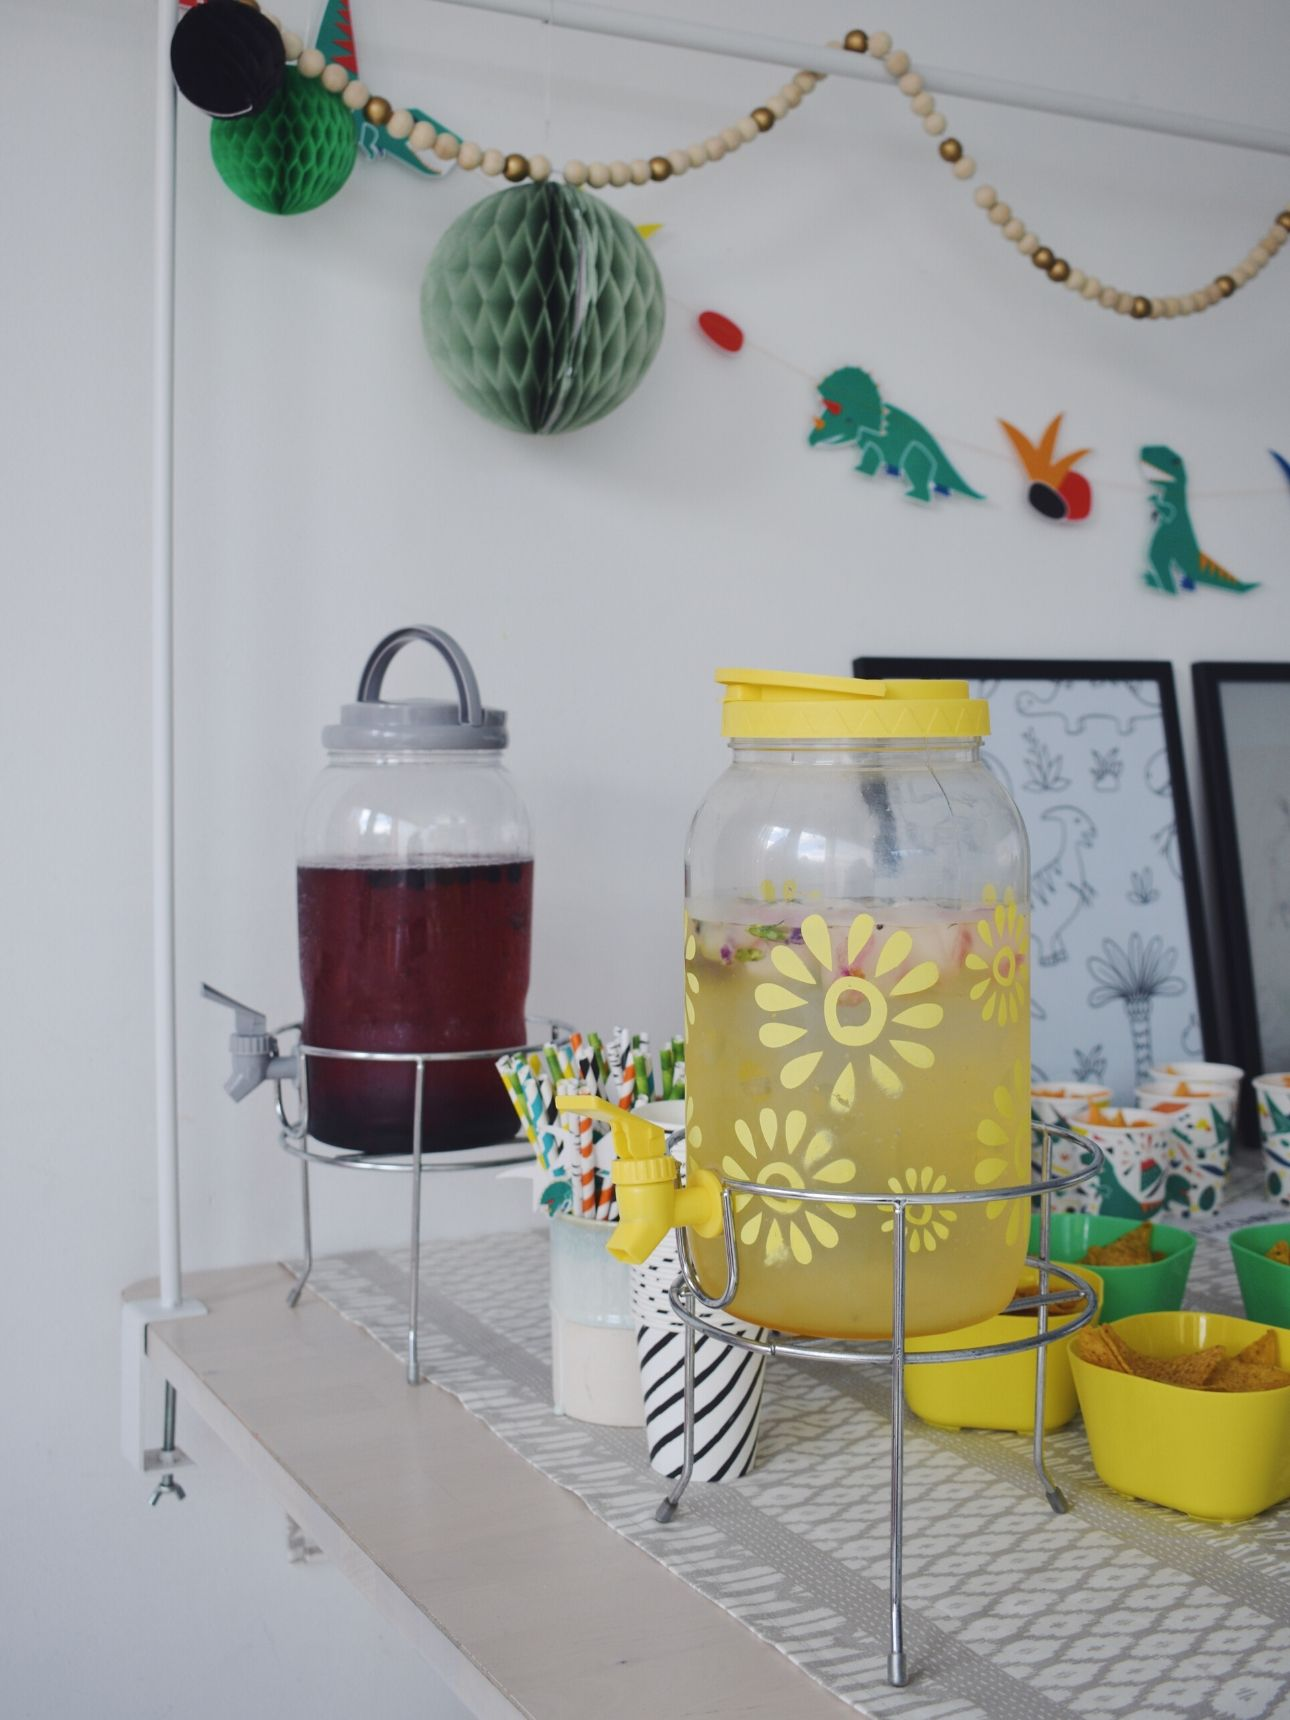 Dino feest limonade tap drinken